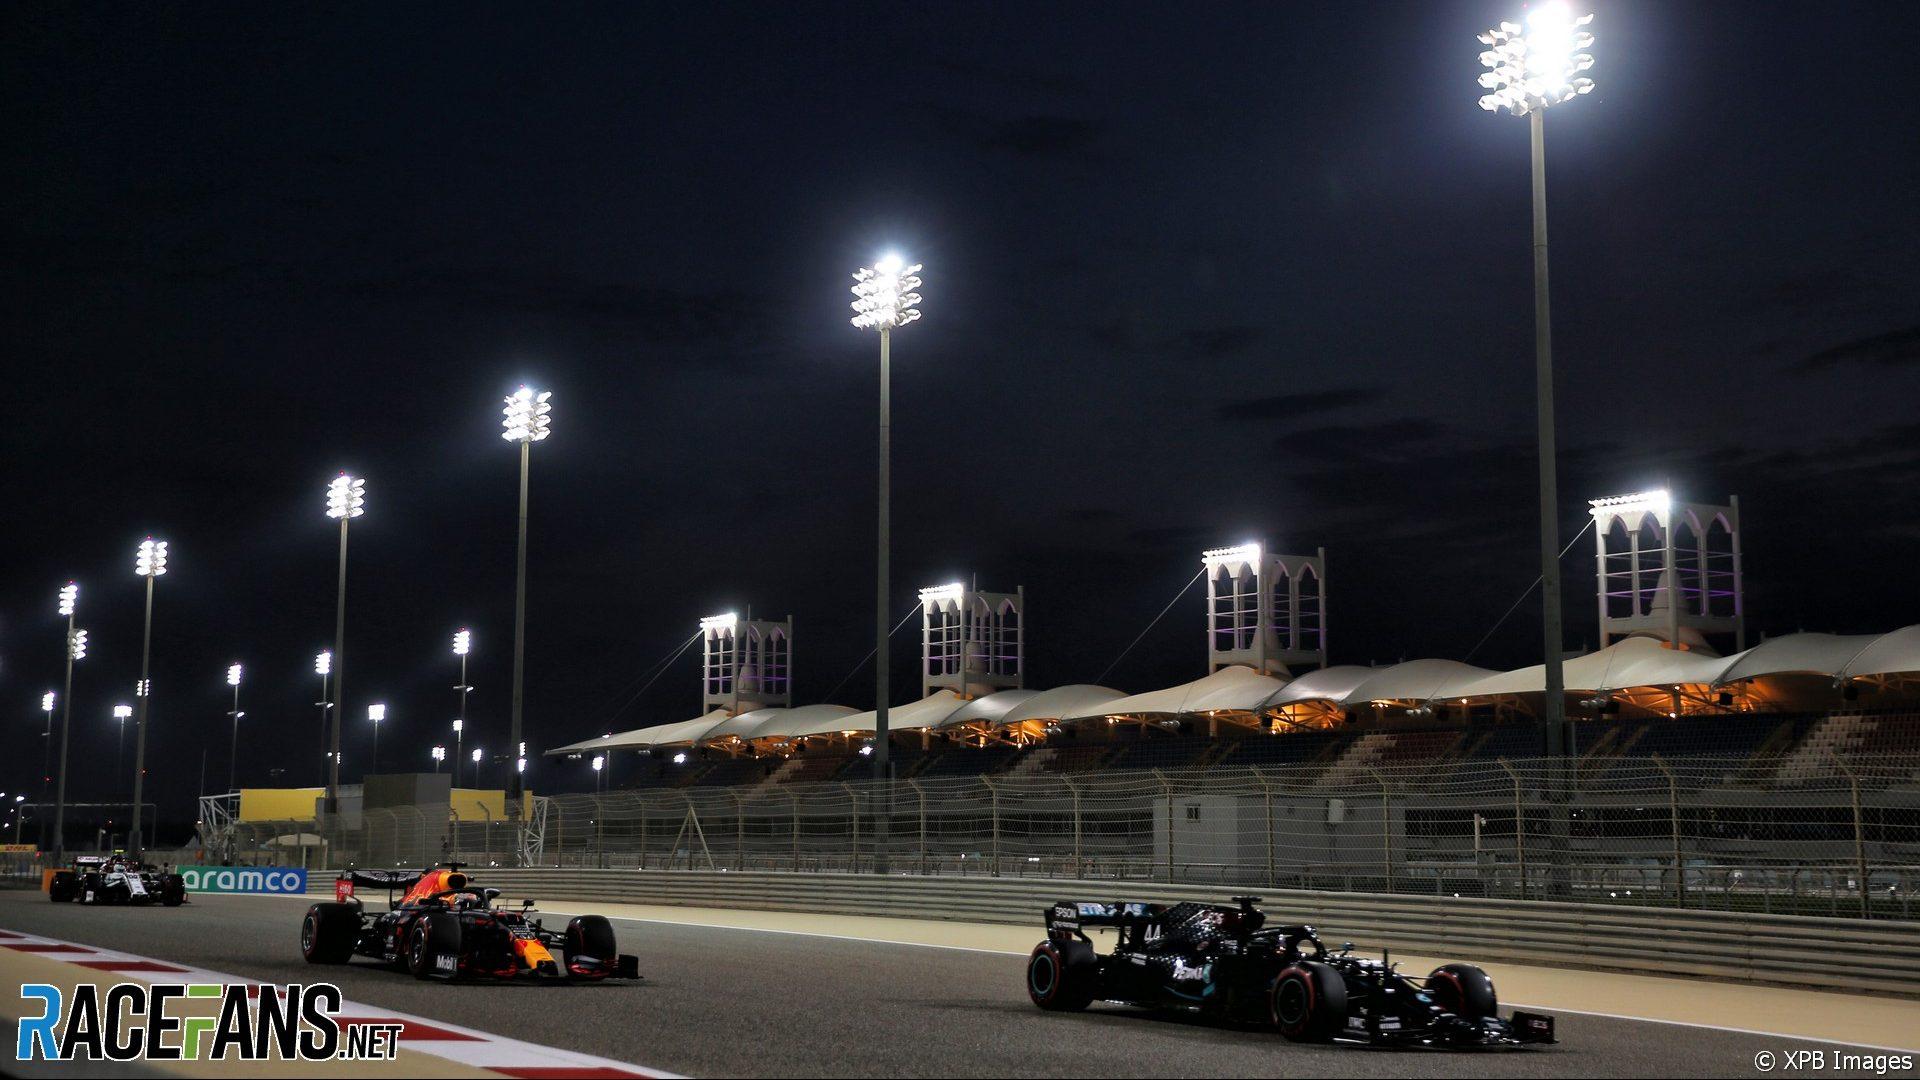 Lewis Hamilton, Mercedes, Bahrain International Circuit, 2020